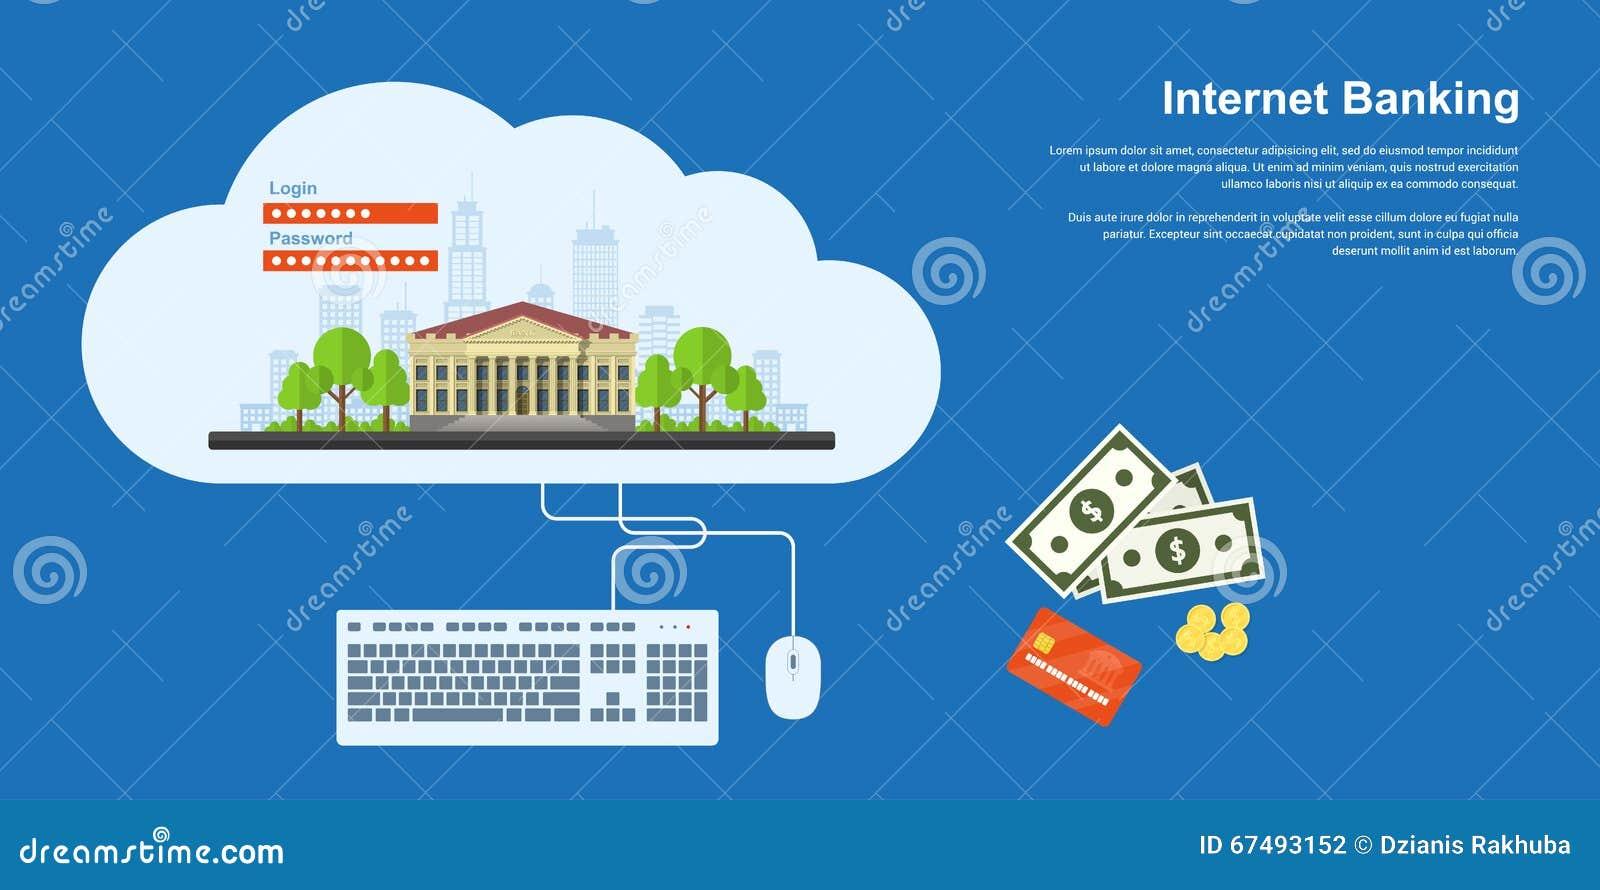 Internet Banking Banner Stock Vector - Image: 67493152